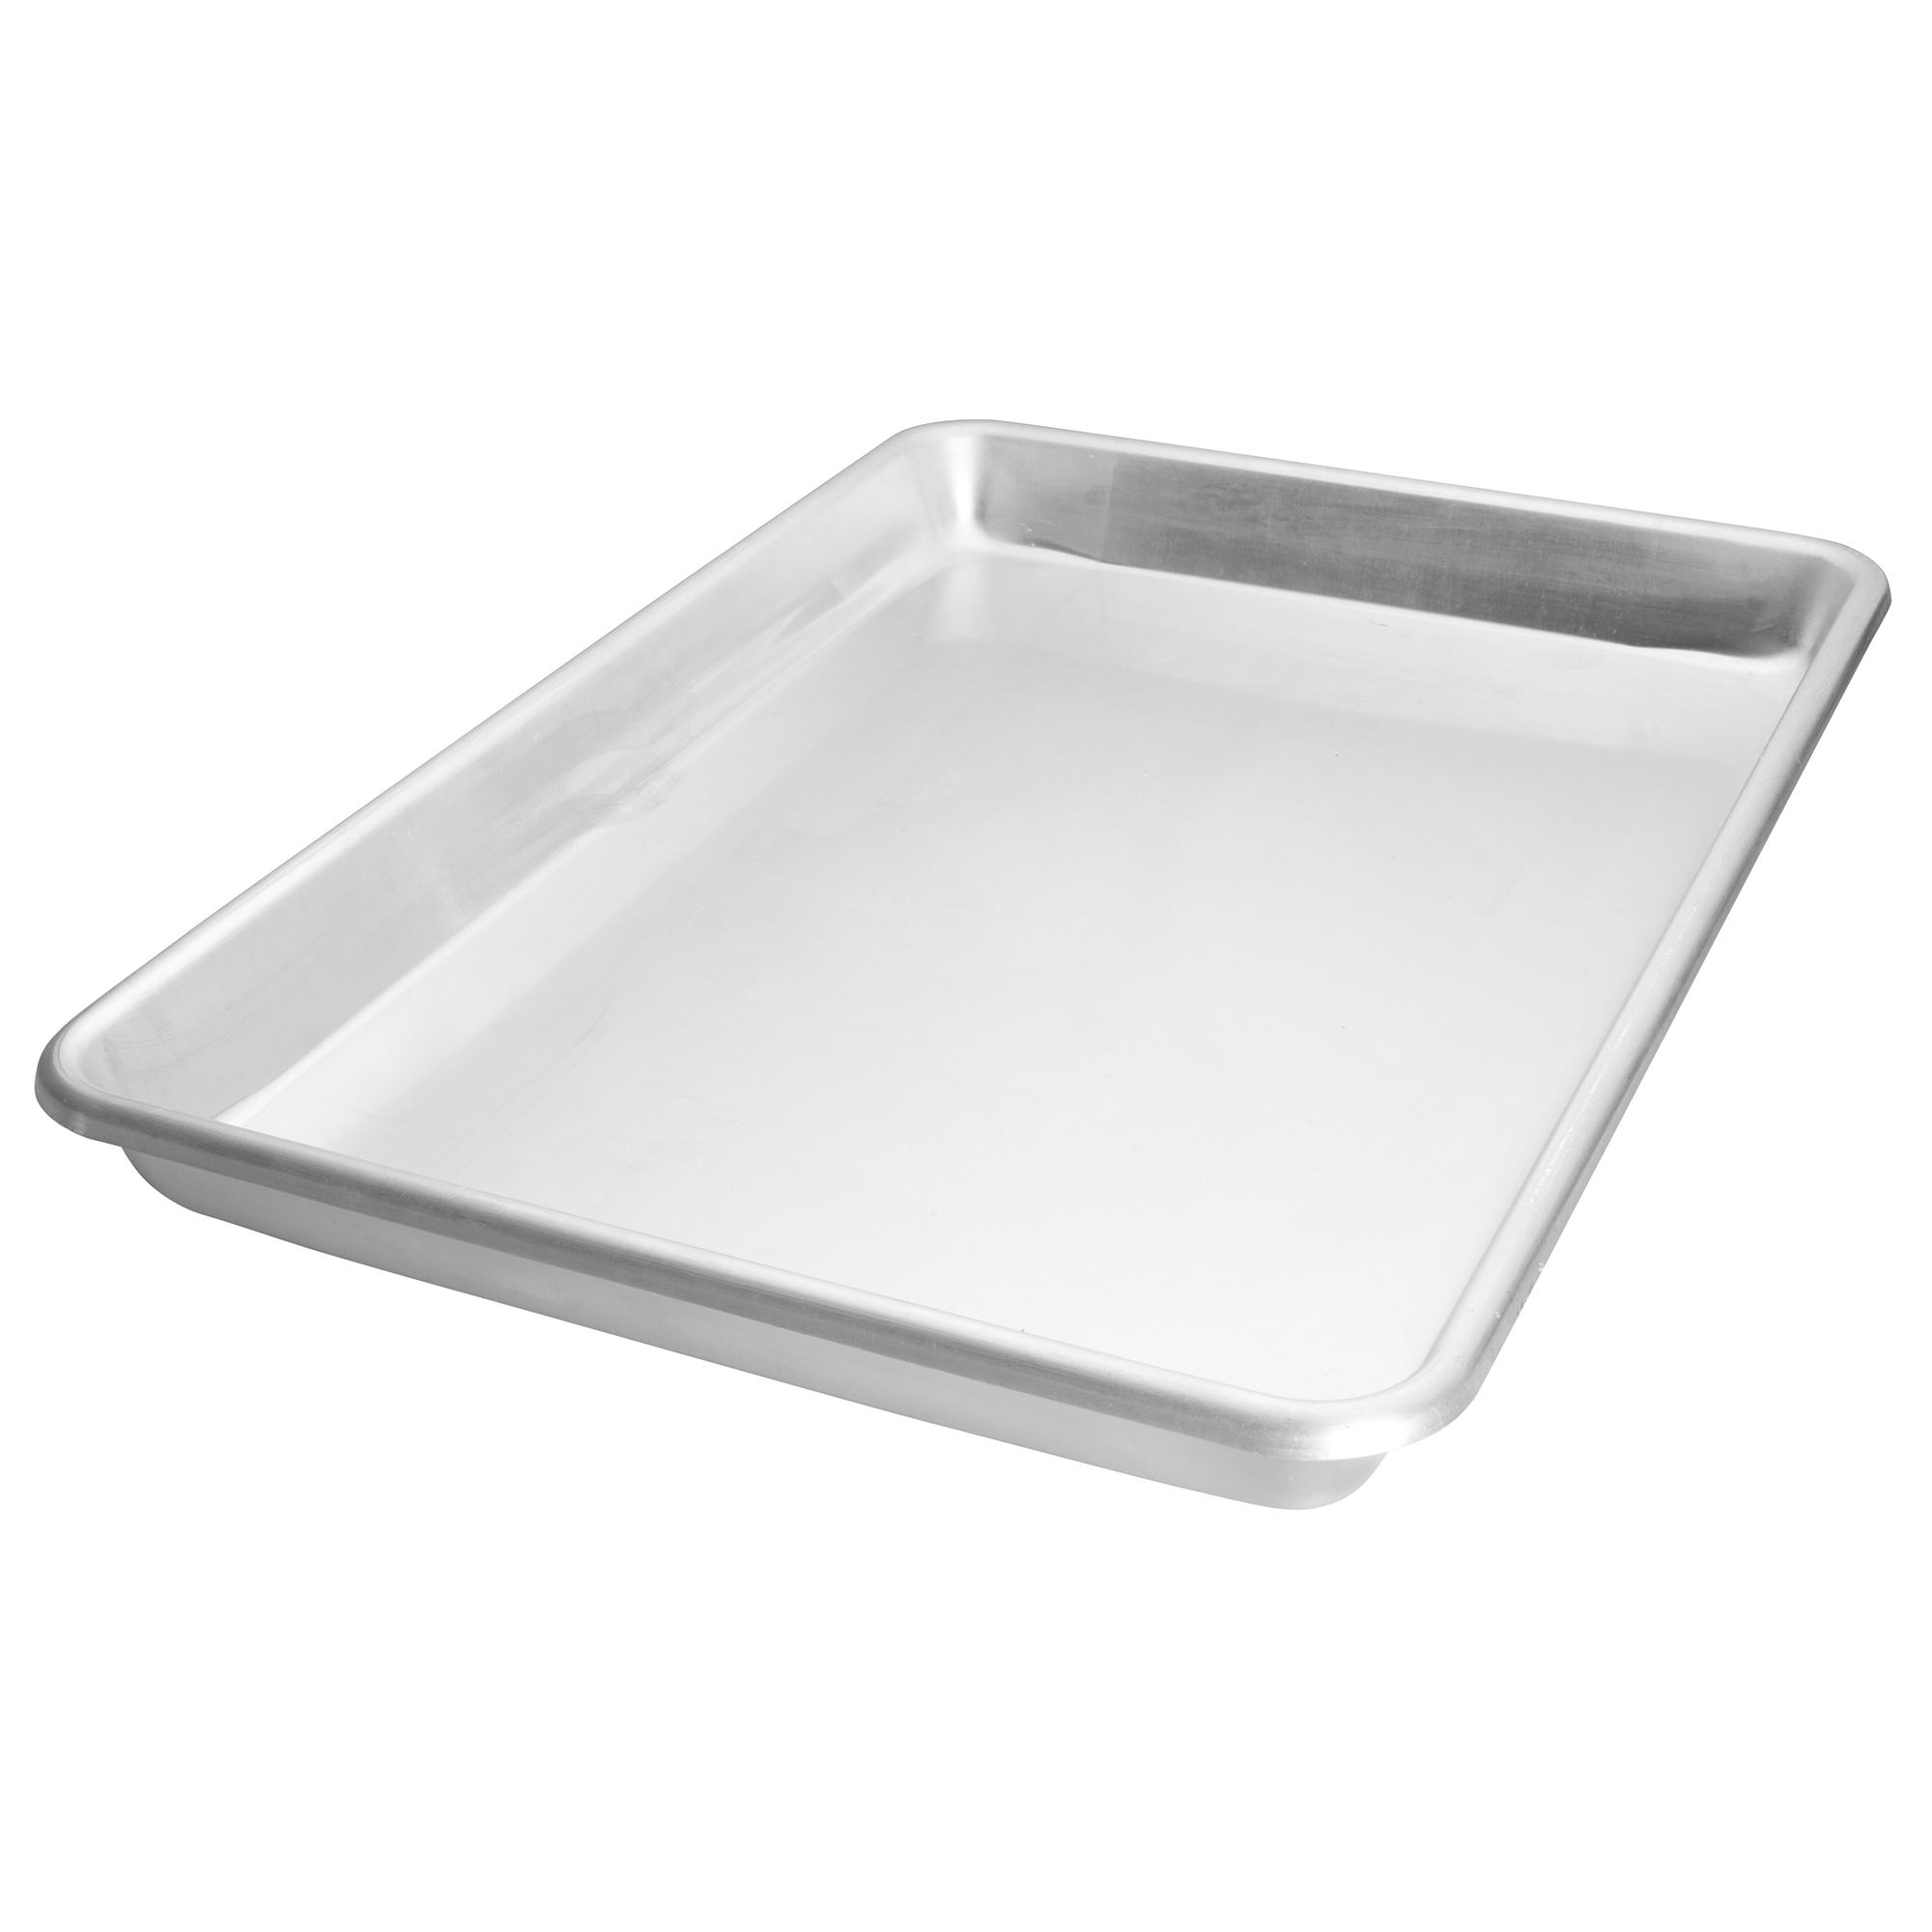 1400-15 Winco ALRP-1826 roasting pan